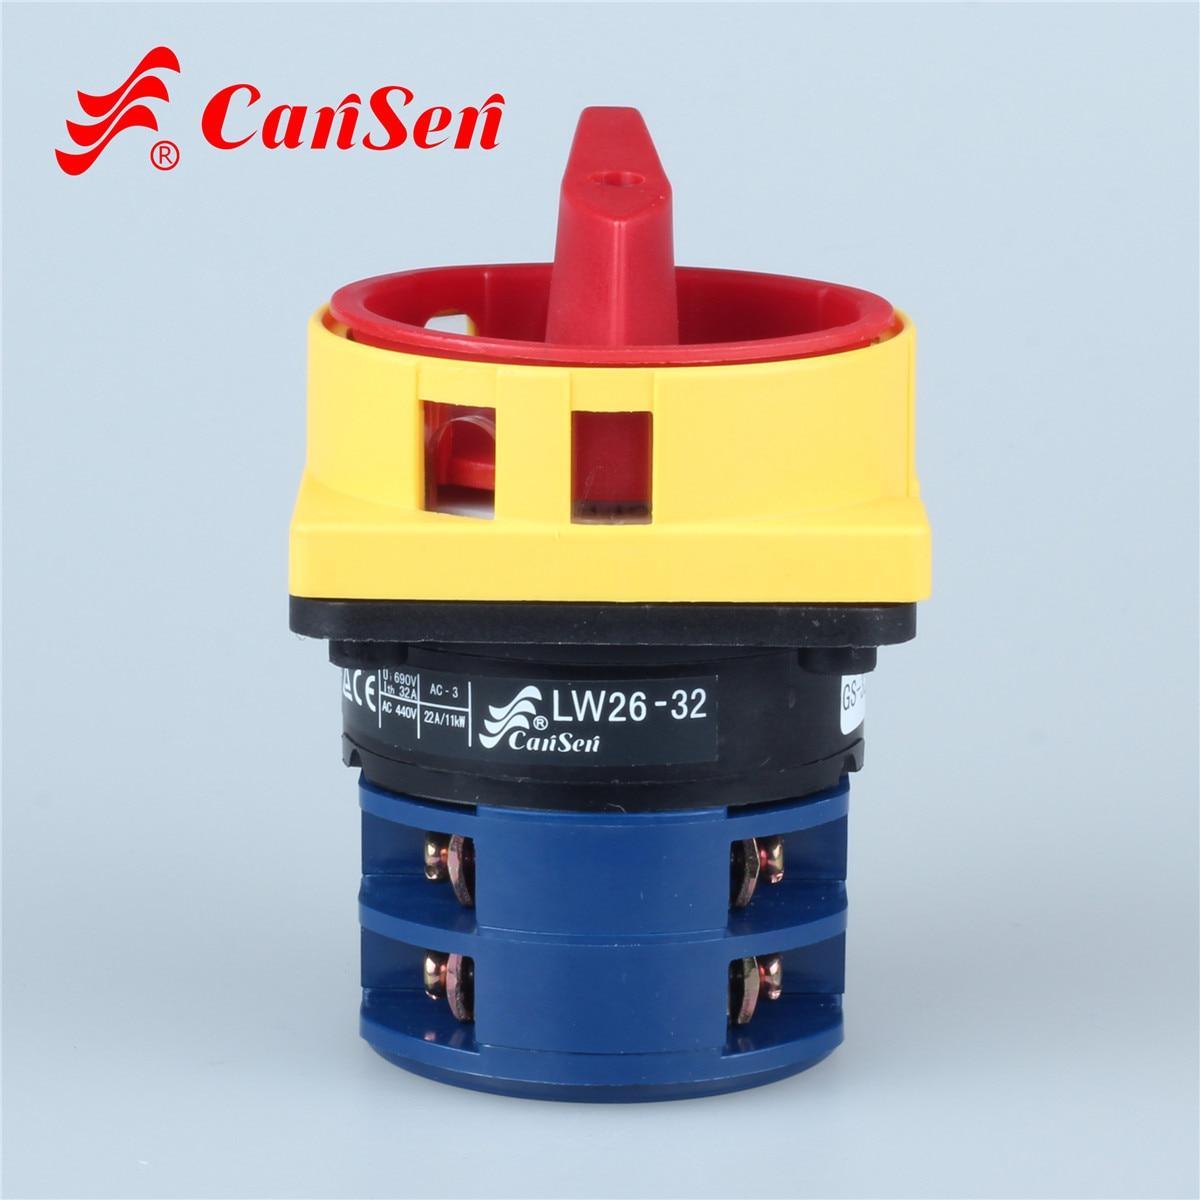 LW26GS-32/04-2 candado interruptor de cámara giratorio Ith 32A apagado 0-1 2 posiciones 4 polos 8 terminales 64*64mm